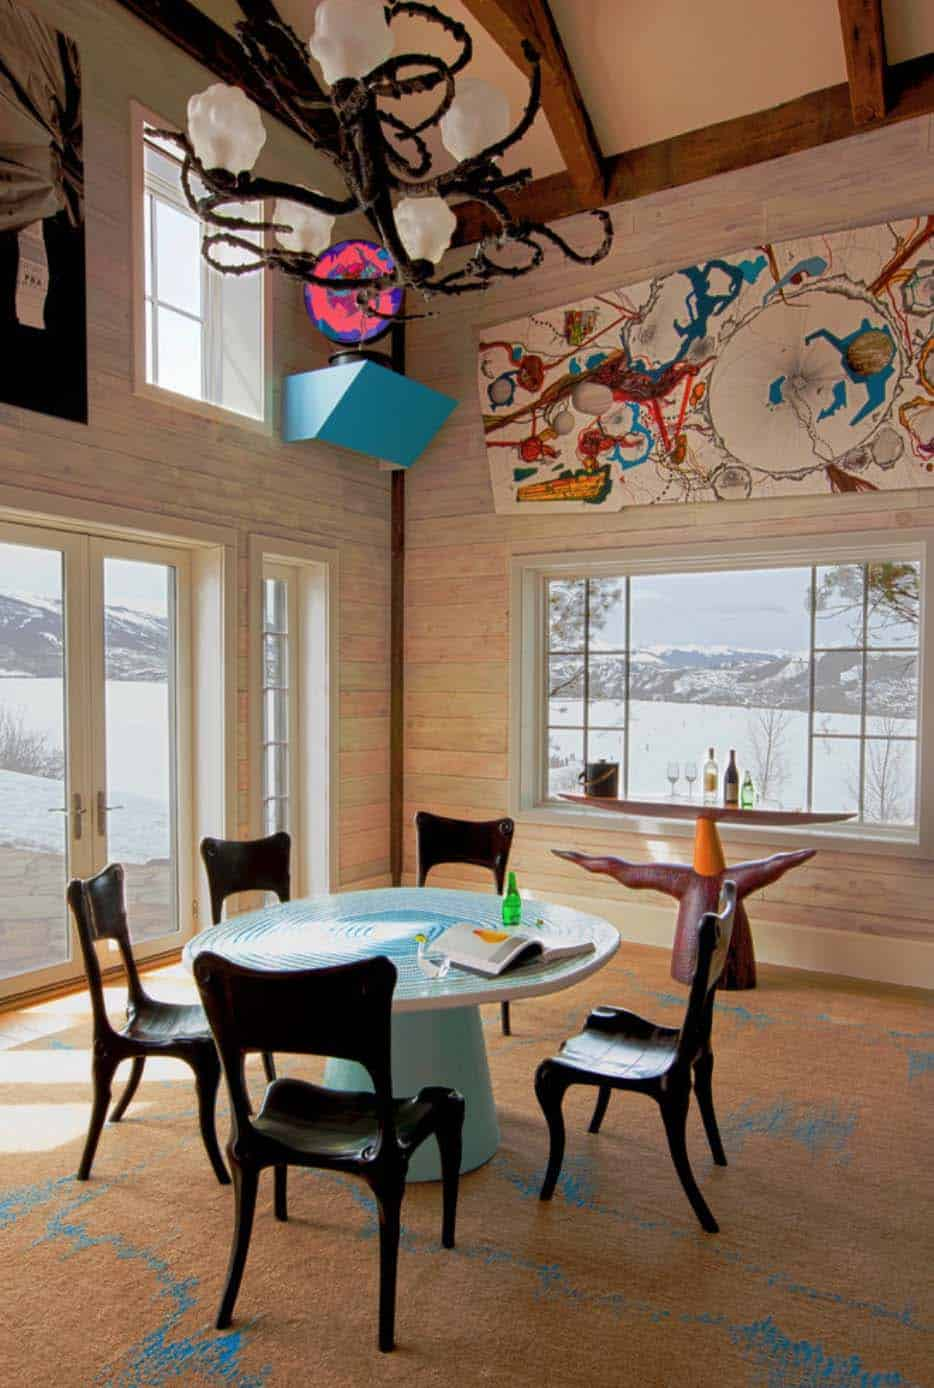 Modern Rustic Mountain Retreat-Frank de Biasi Interiors-07-1 Kindesign